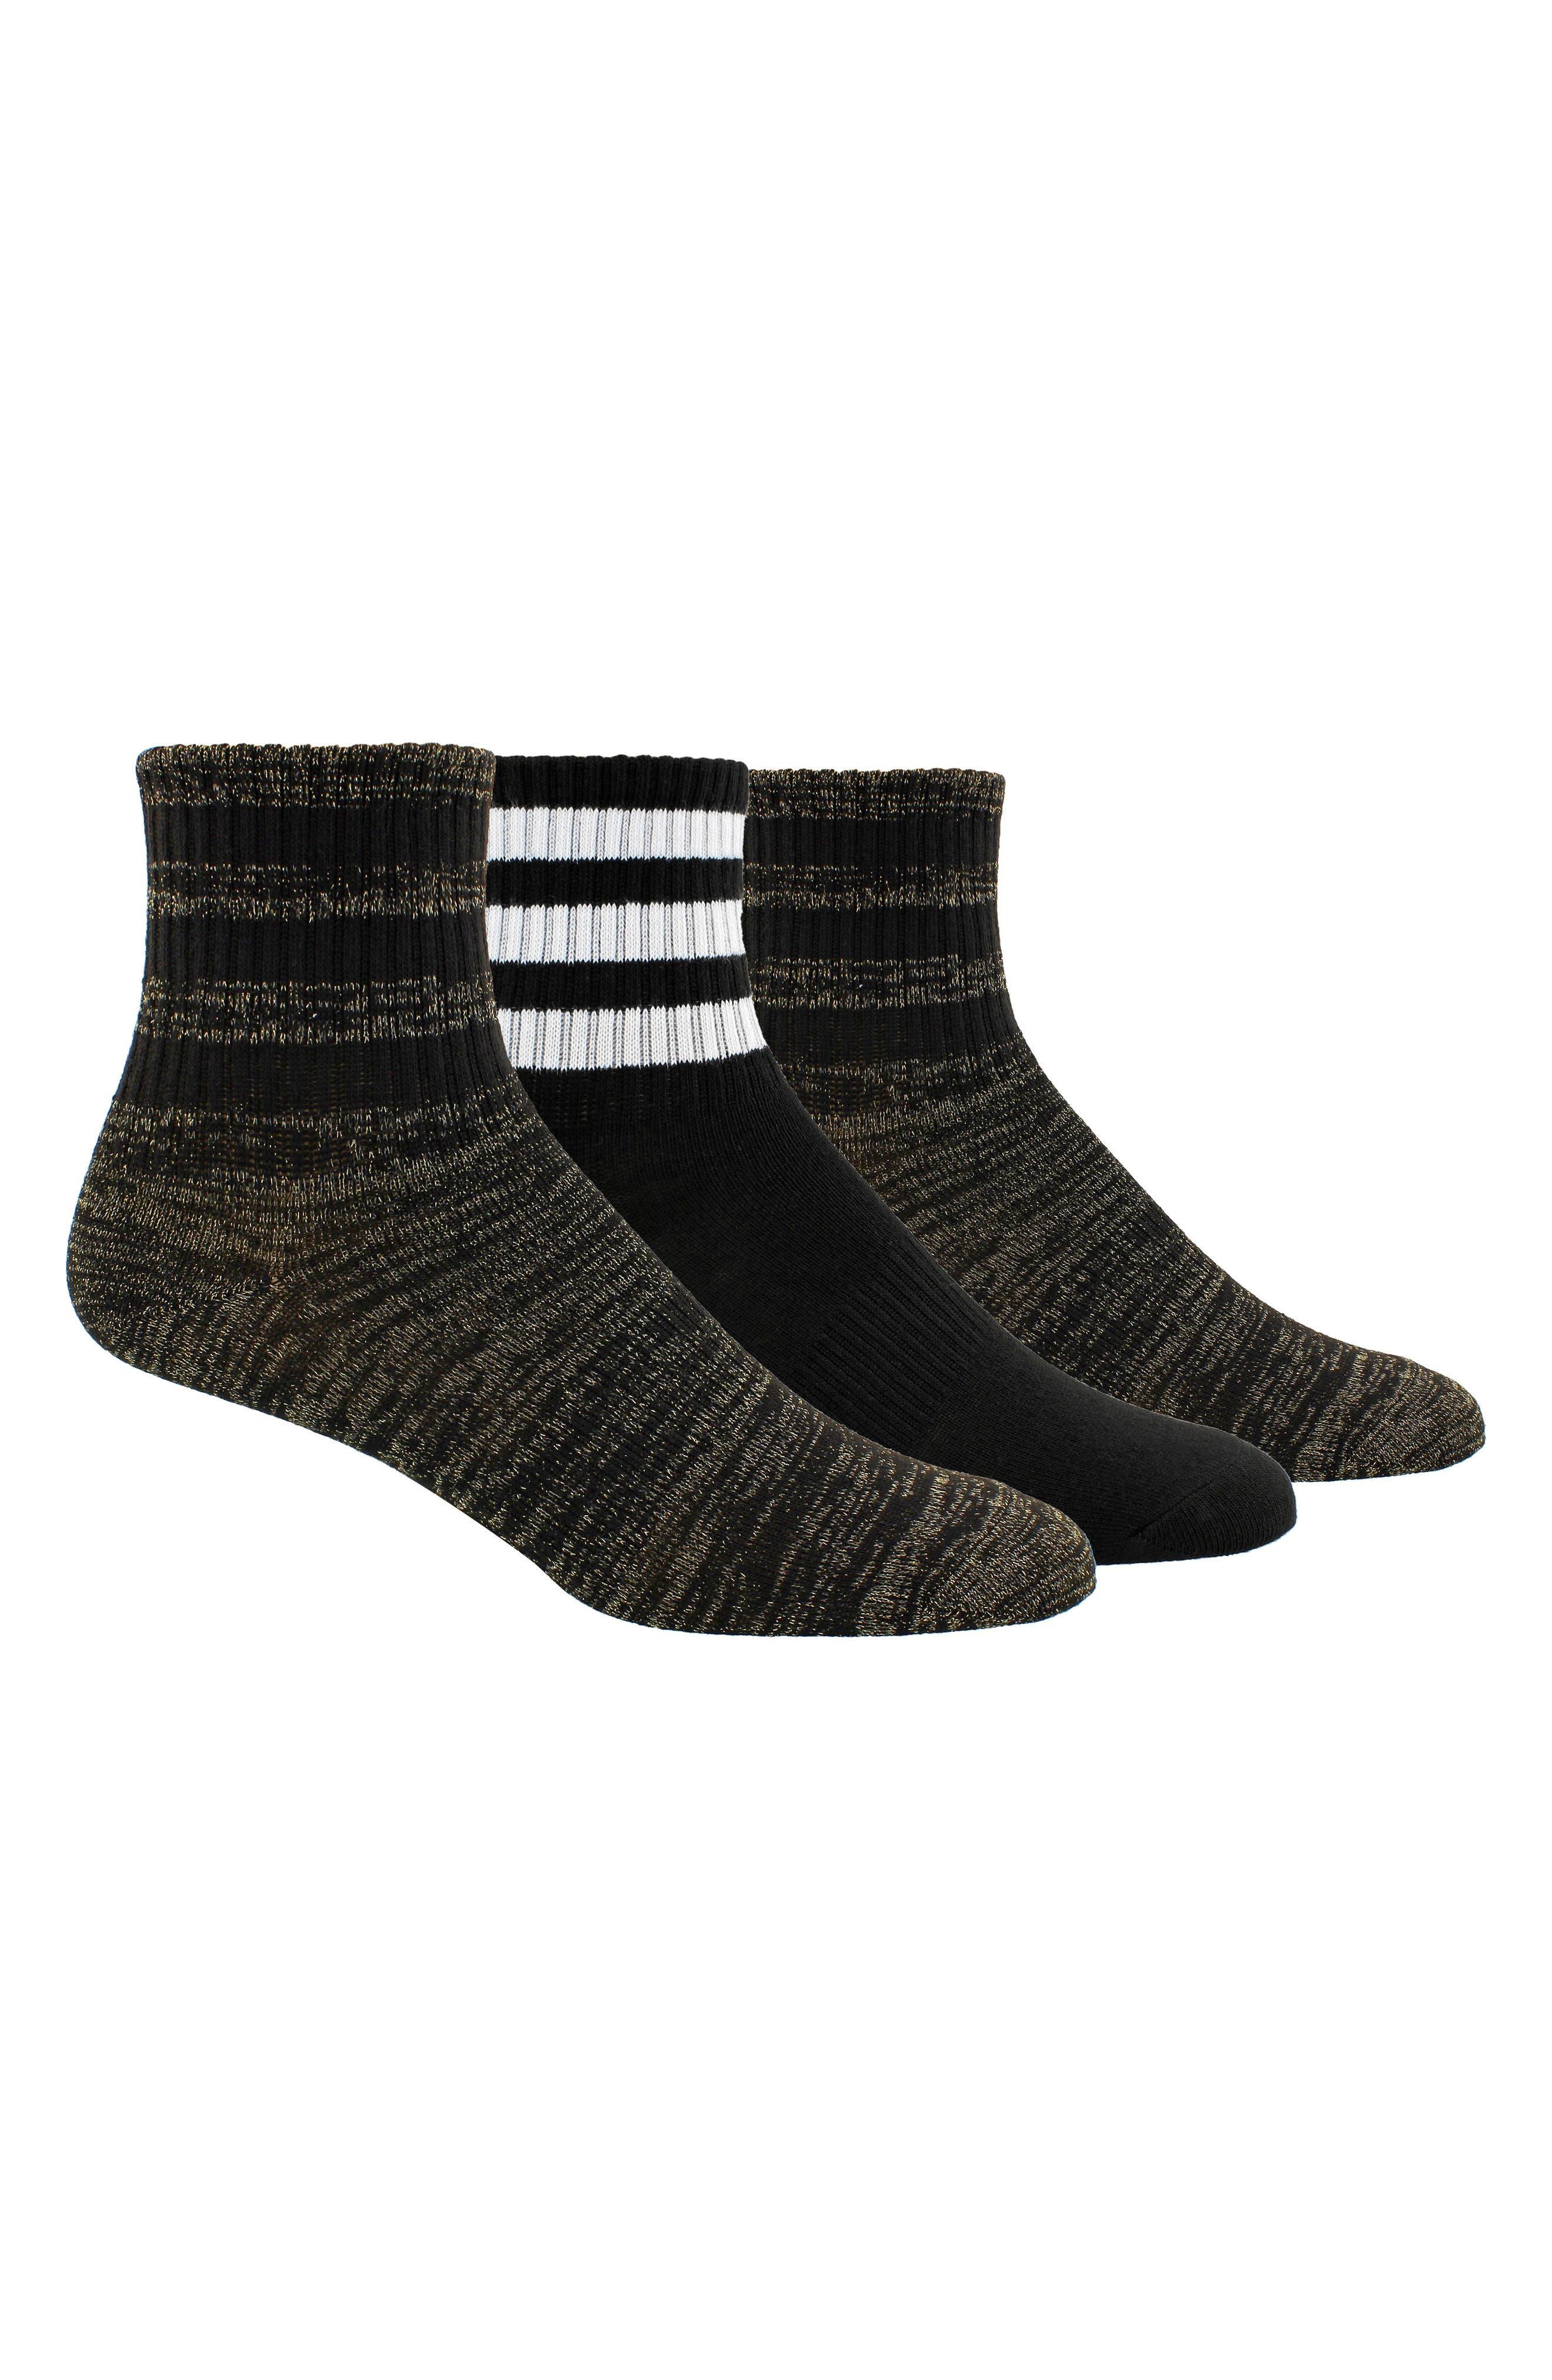 adidas 3-Stripes 3-Pack Ankle Socks